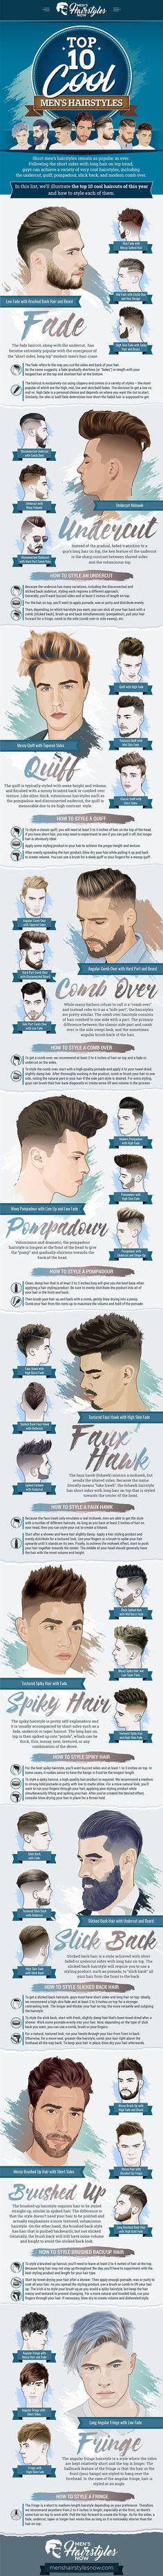 best corte de cabello images on pinterest in menus